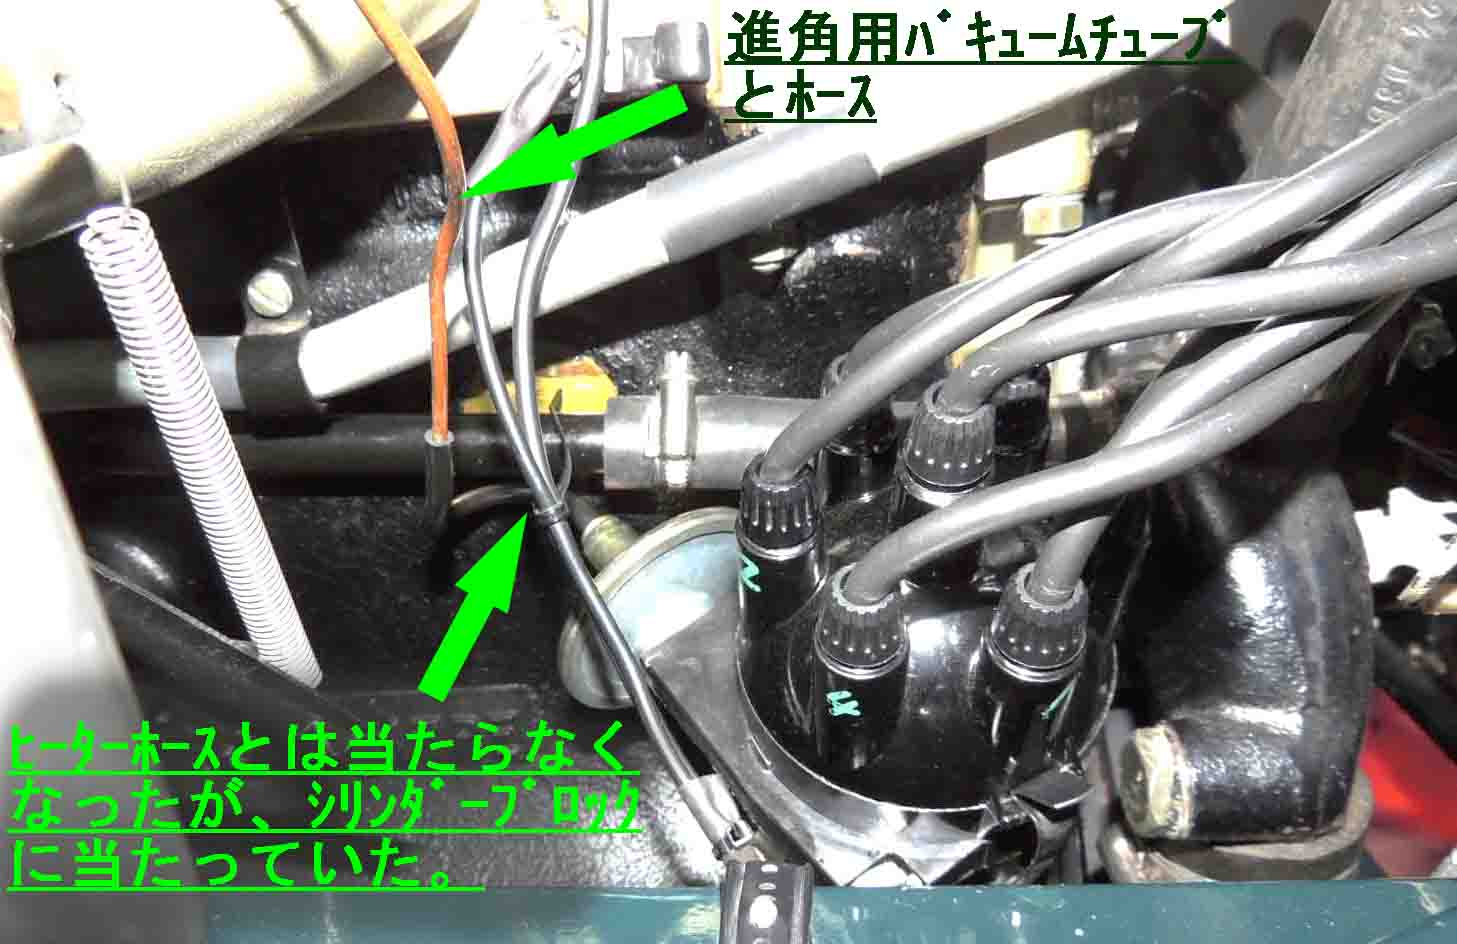 bloggDSCN3234.jpg